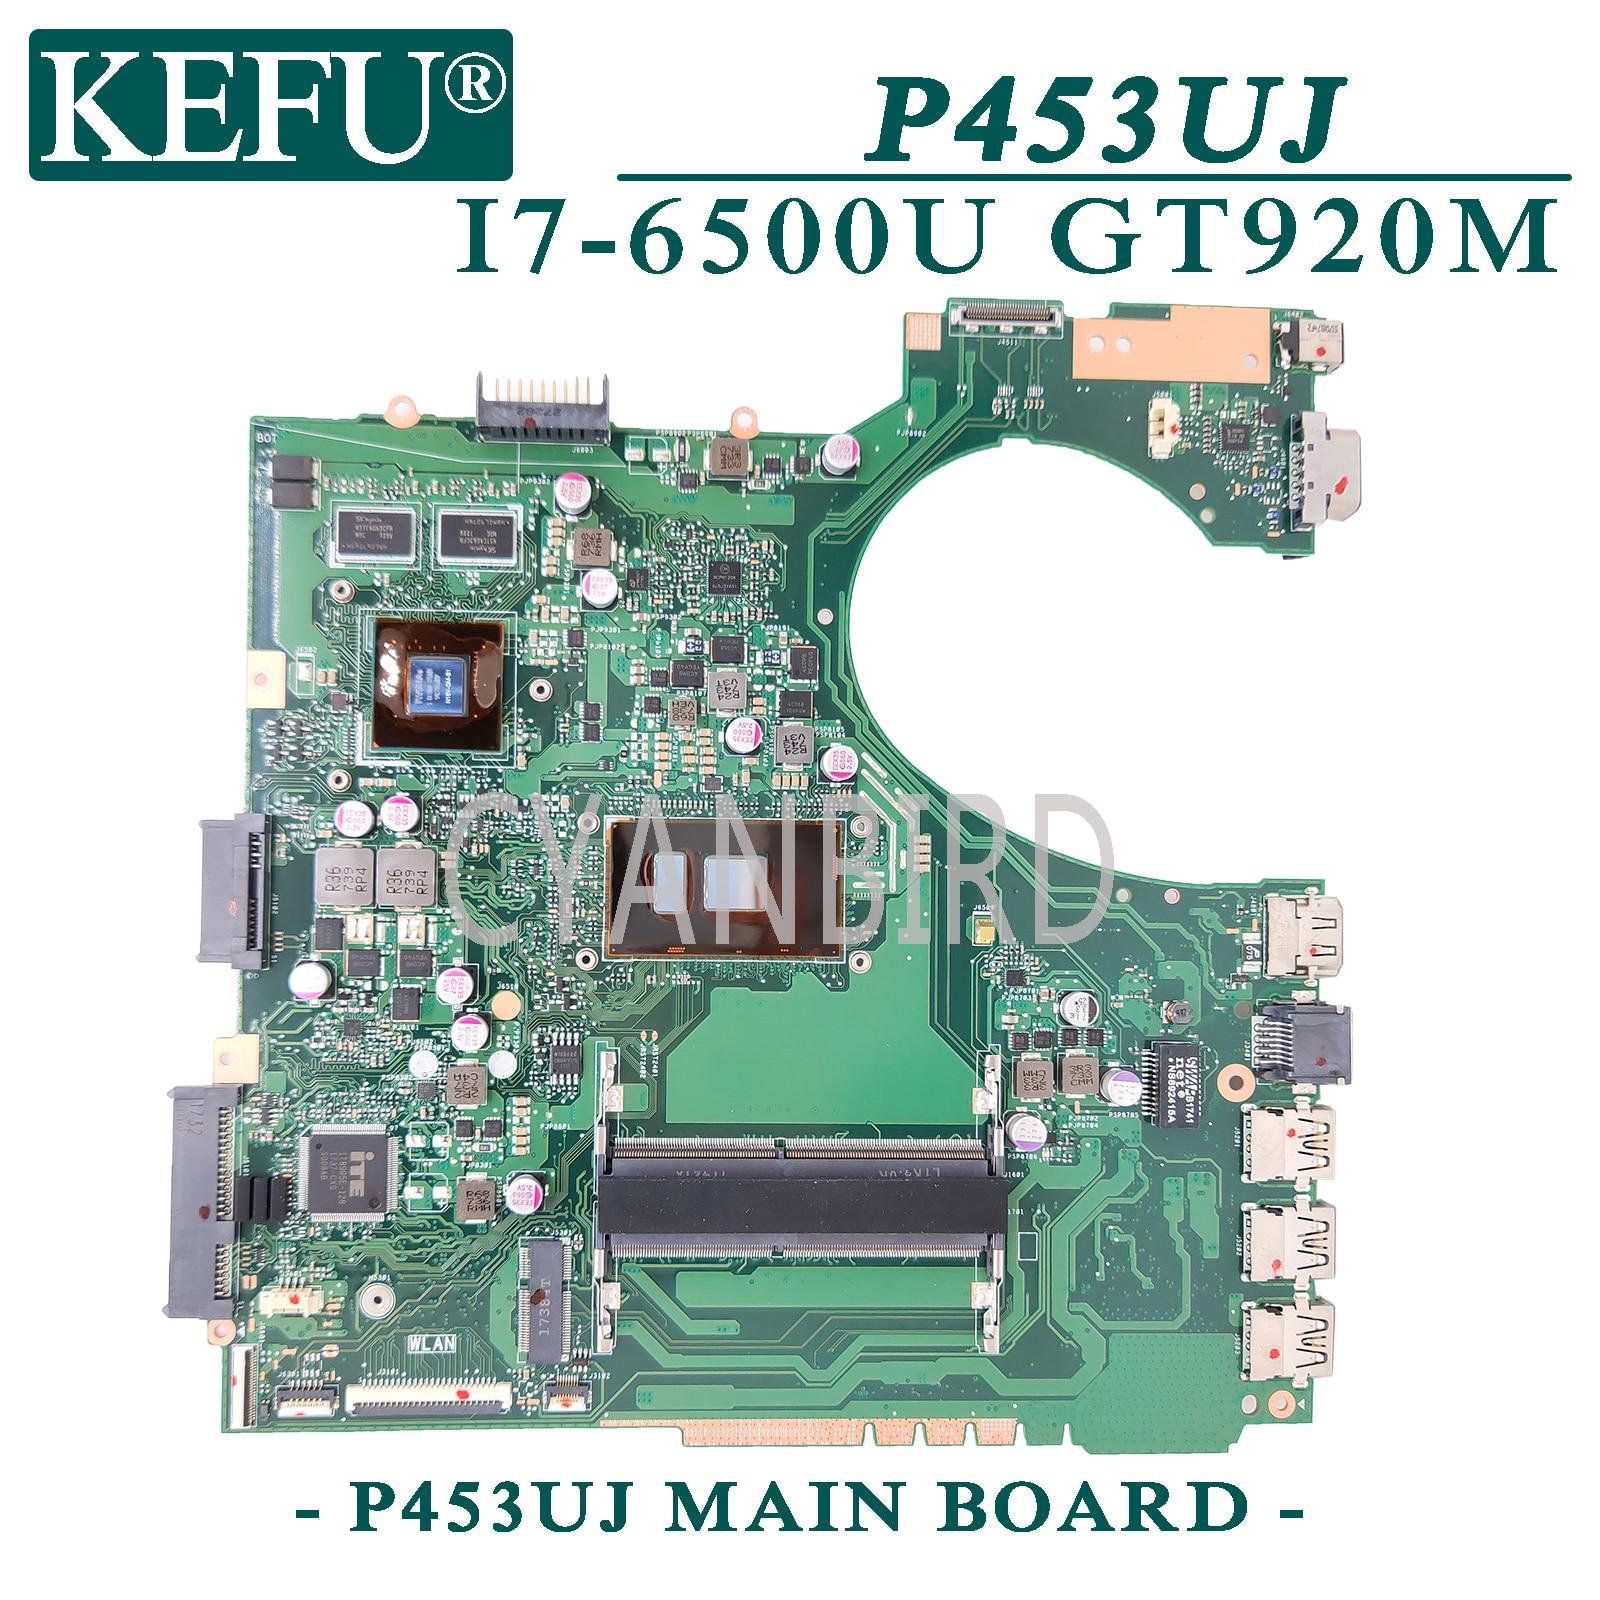 KEFU P453UJ اللوحة الأصلية ل ASUS P453UJ P453U مع I7-6500U GT920M-2G اللوحة المحمول